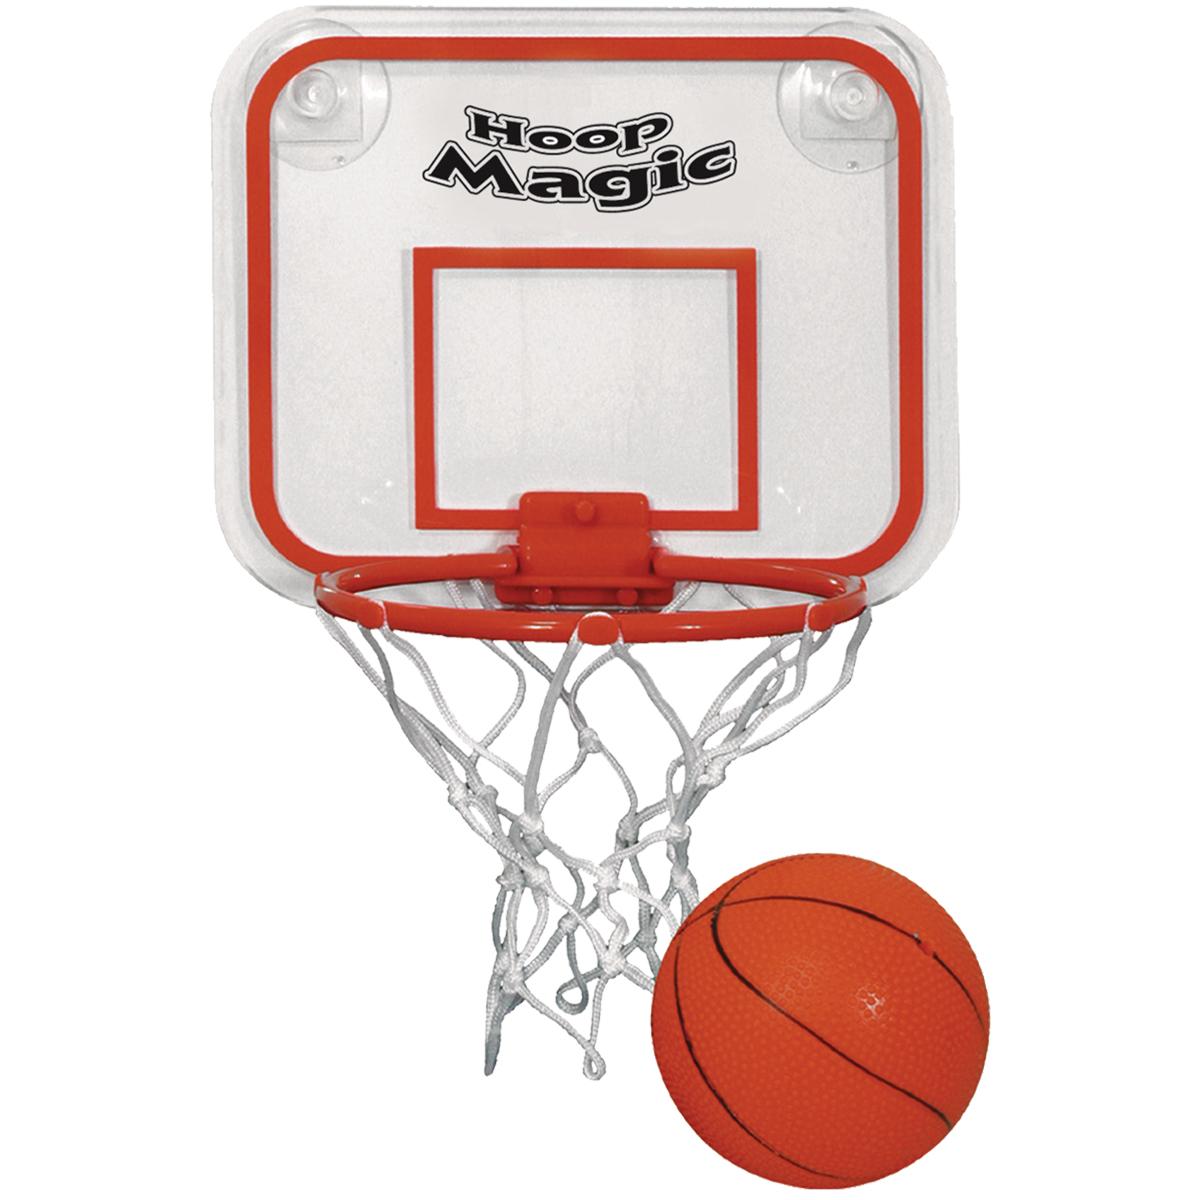 54 mini basketball hoop set - Canasta de baloncesto ...